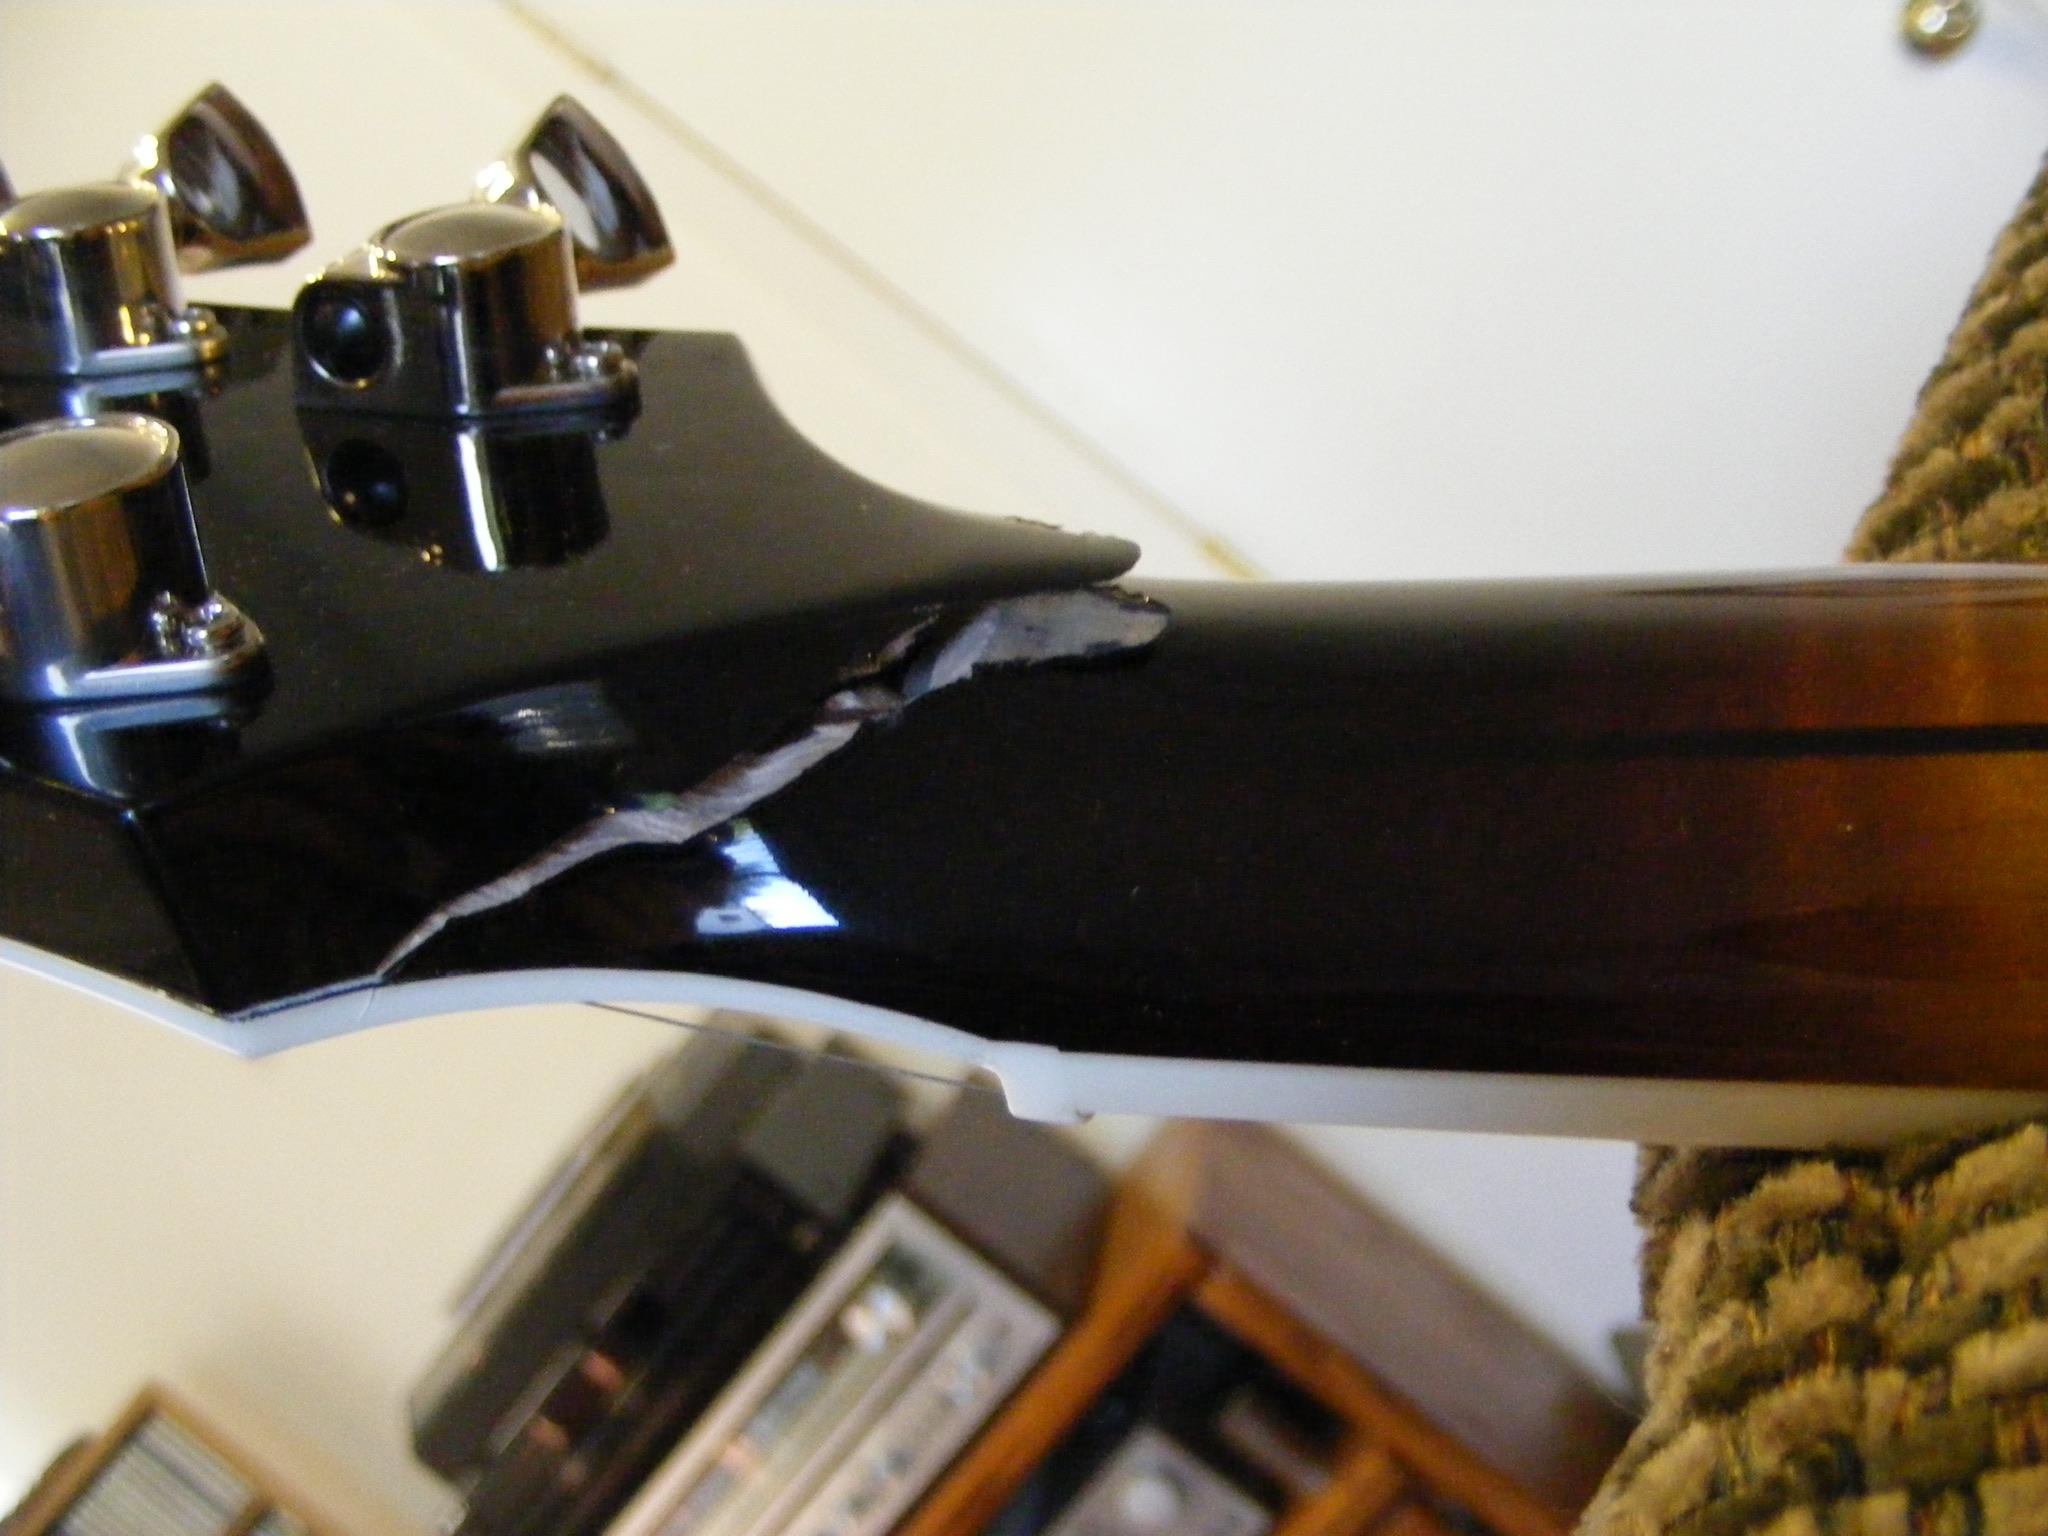 Gibson vs Campellone headstocks-c4aa572d-bf03-4479-9cf0-d48d2819379a-jpeg